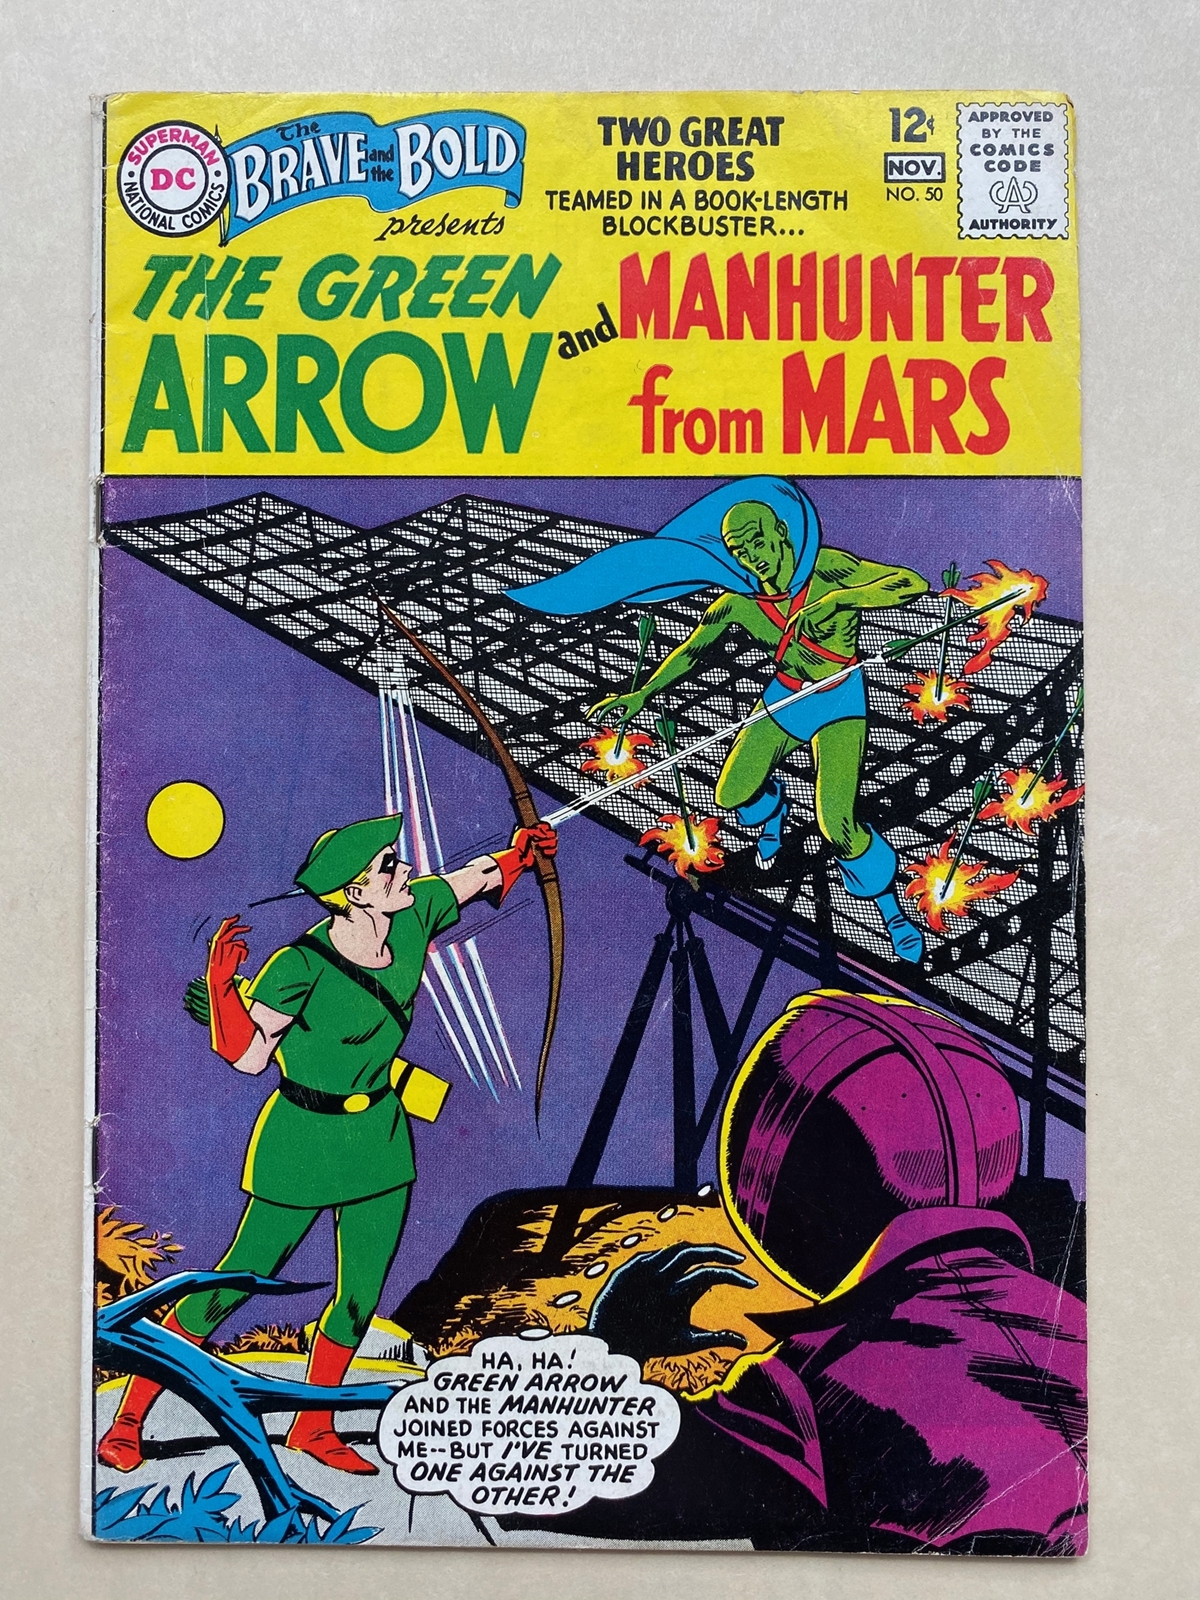 Lot 2160 - BRAVE & BOLD #50 - MARTIAN MANHUNTER & GREEN ARROW - (1963 - DC) FN/VFN (Cents Copy) - First